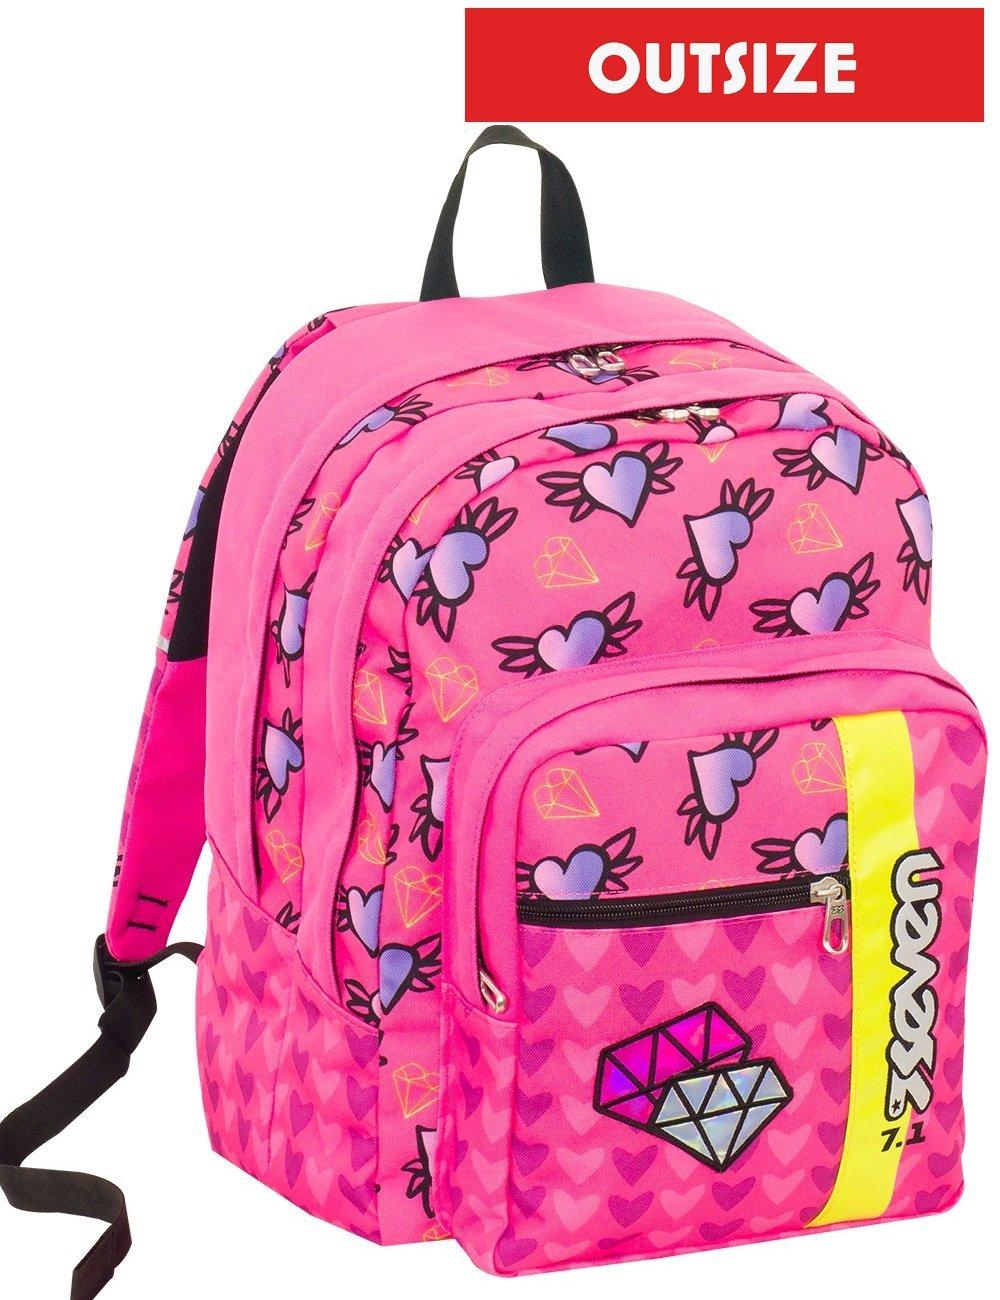 Seven s.p.a.学校バックパックOutsize Seven – Shifty Girl – ピンク – 33 LTリュックサック – 学生バッグ   B07BMYHNLZ